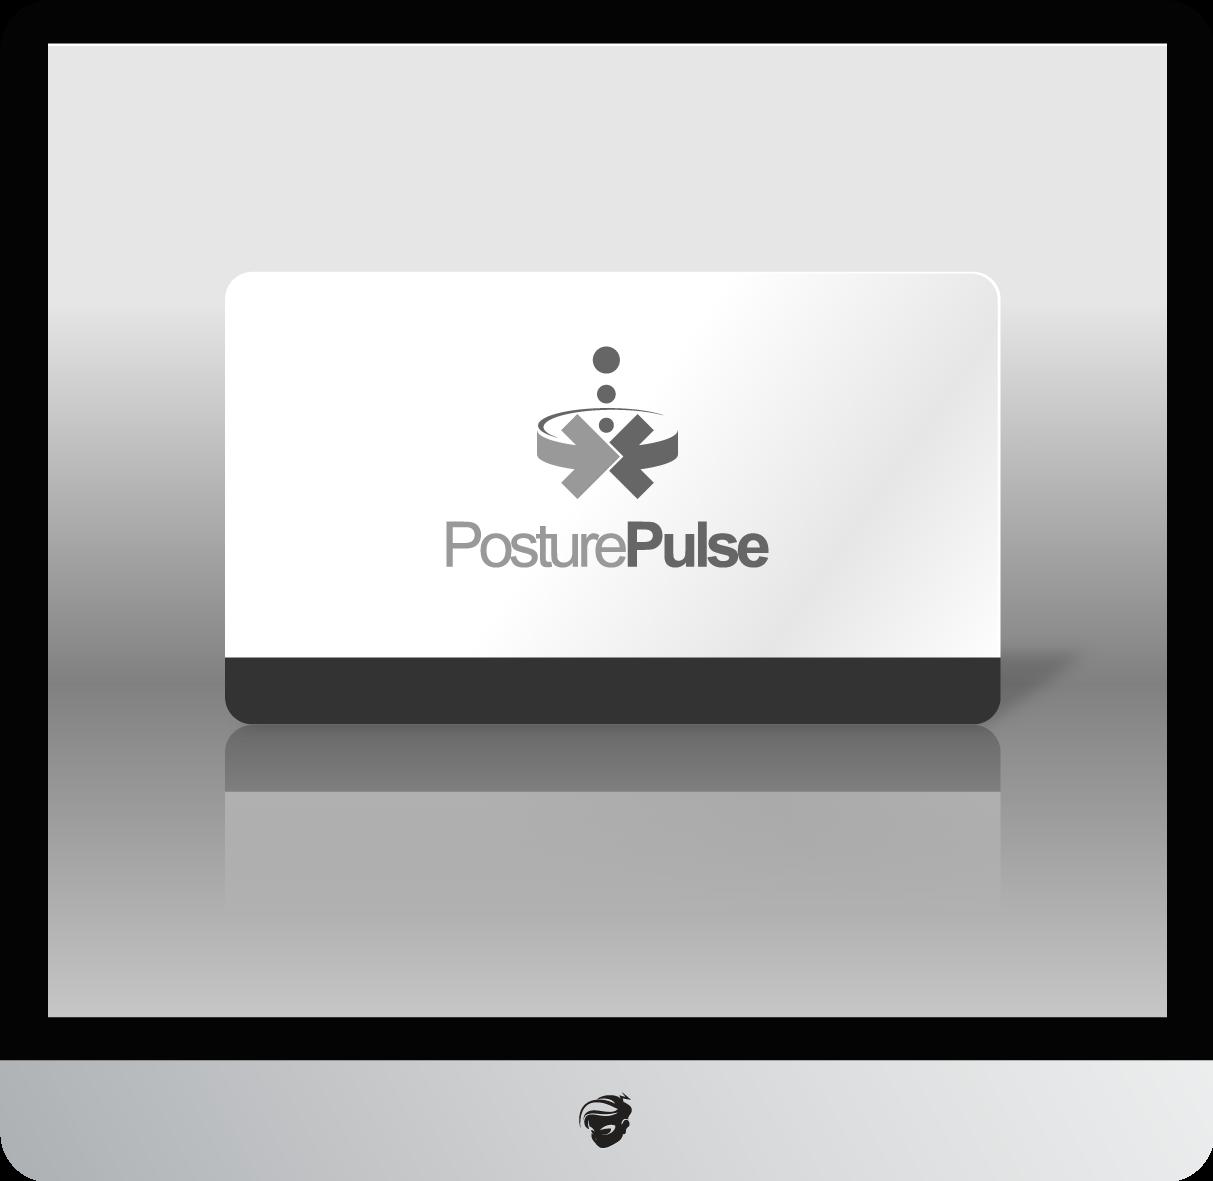 Logo Design by zesthar - Entry No. 56 in the Logo Design Contest Unique Logo Design Wanted for PosturePulse.